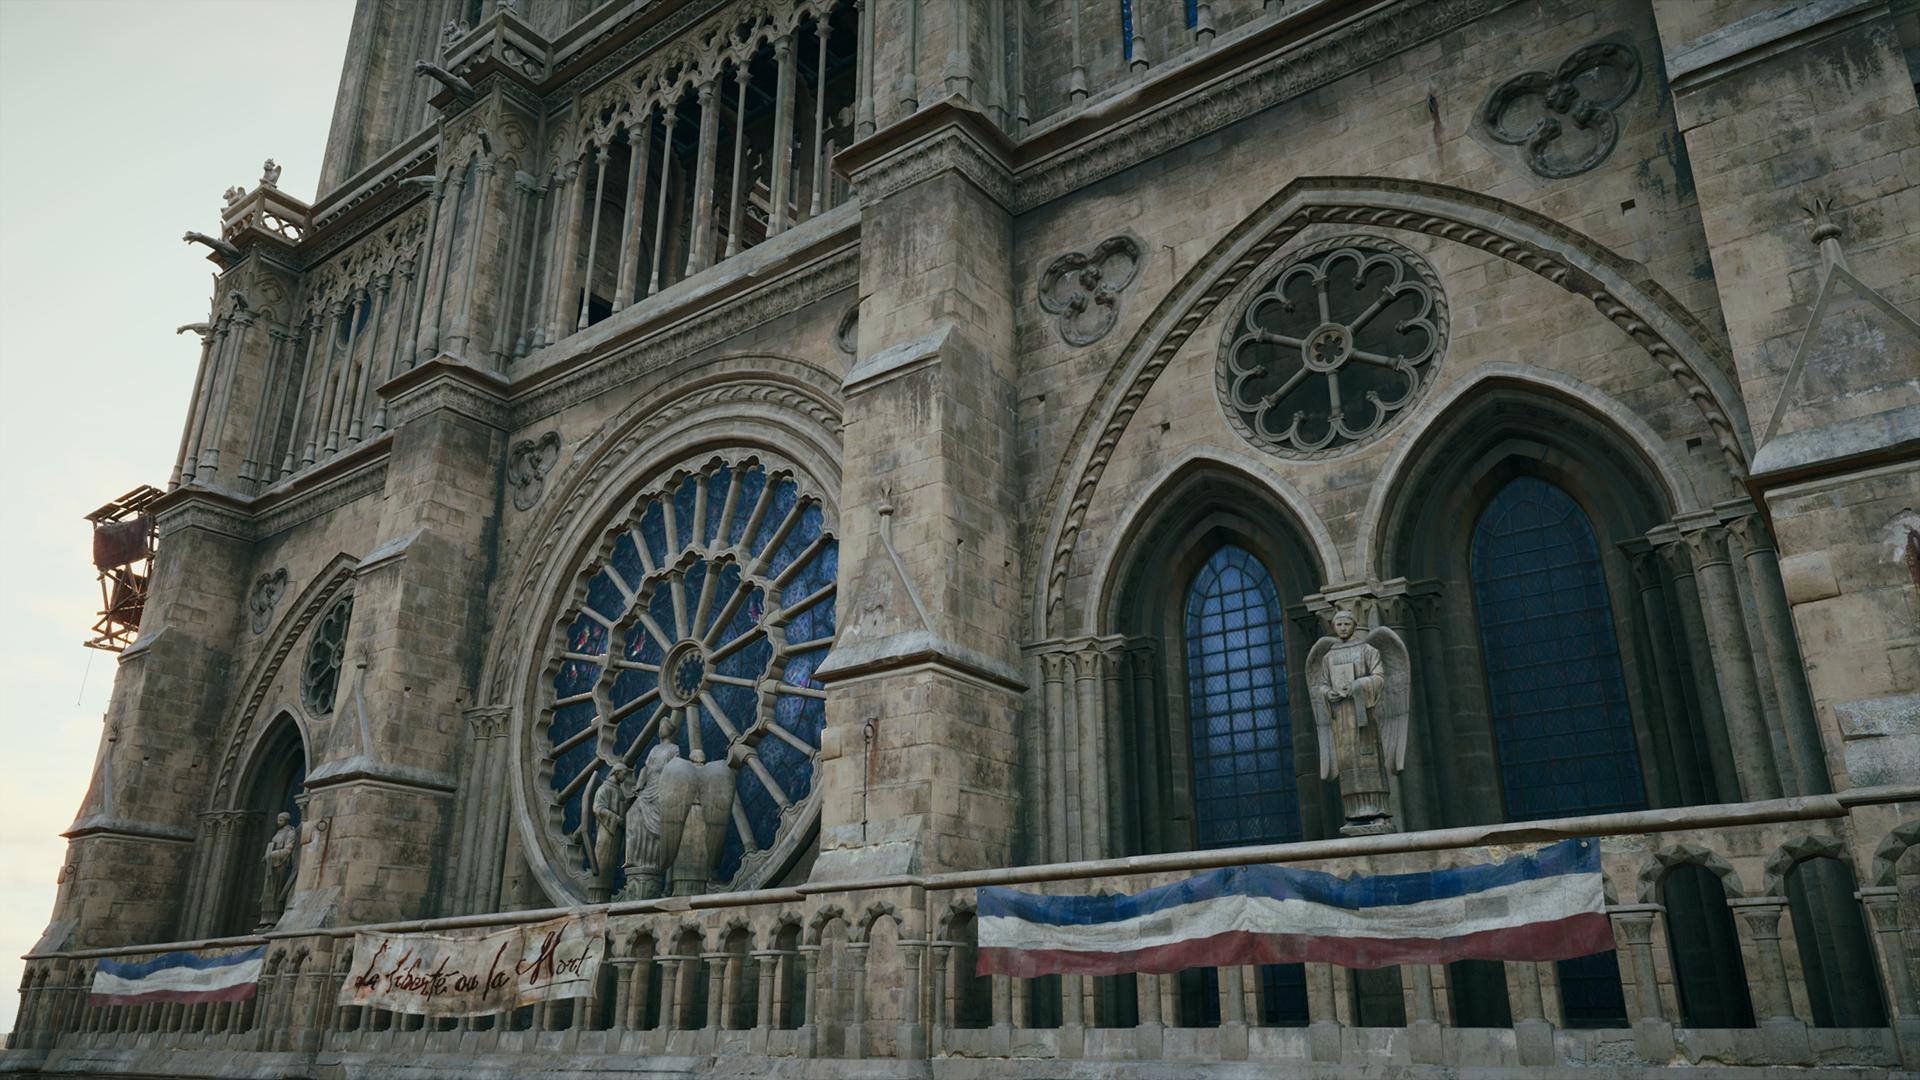 Assassins creed unity max settings 4k